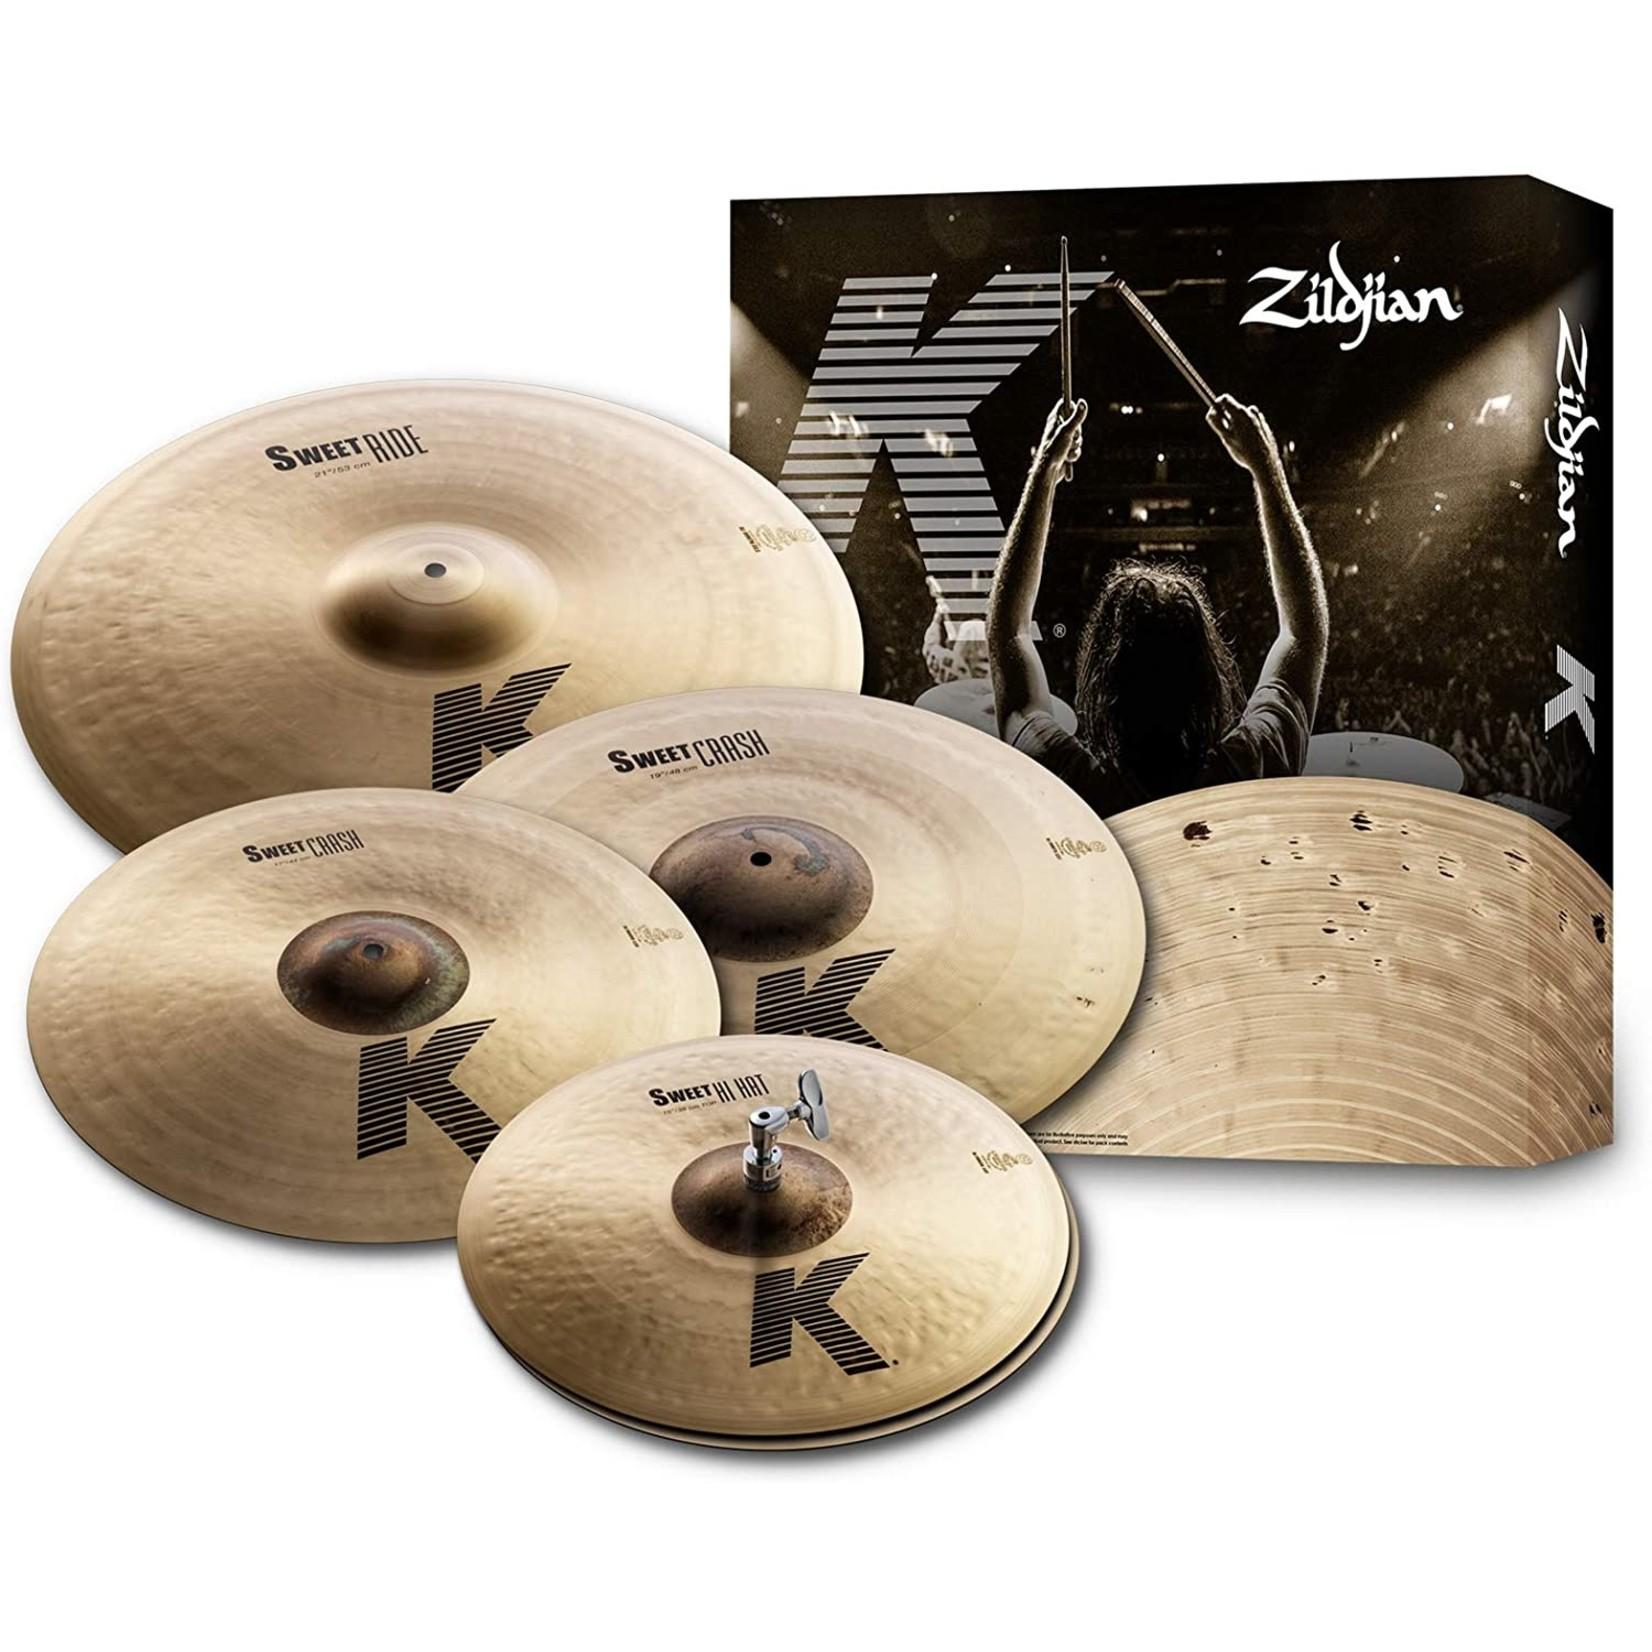 Zildjian Zildjian K Sweet Cymbal Pack